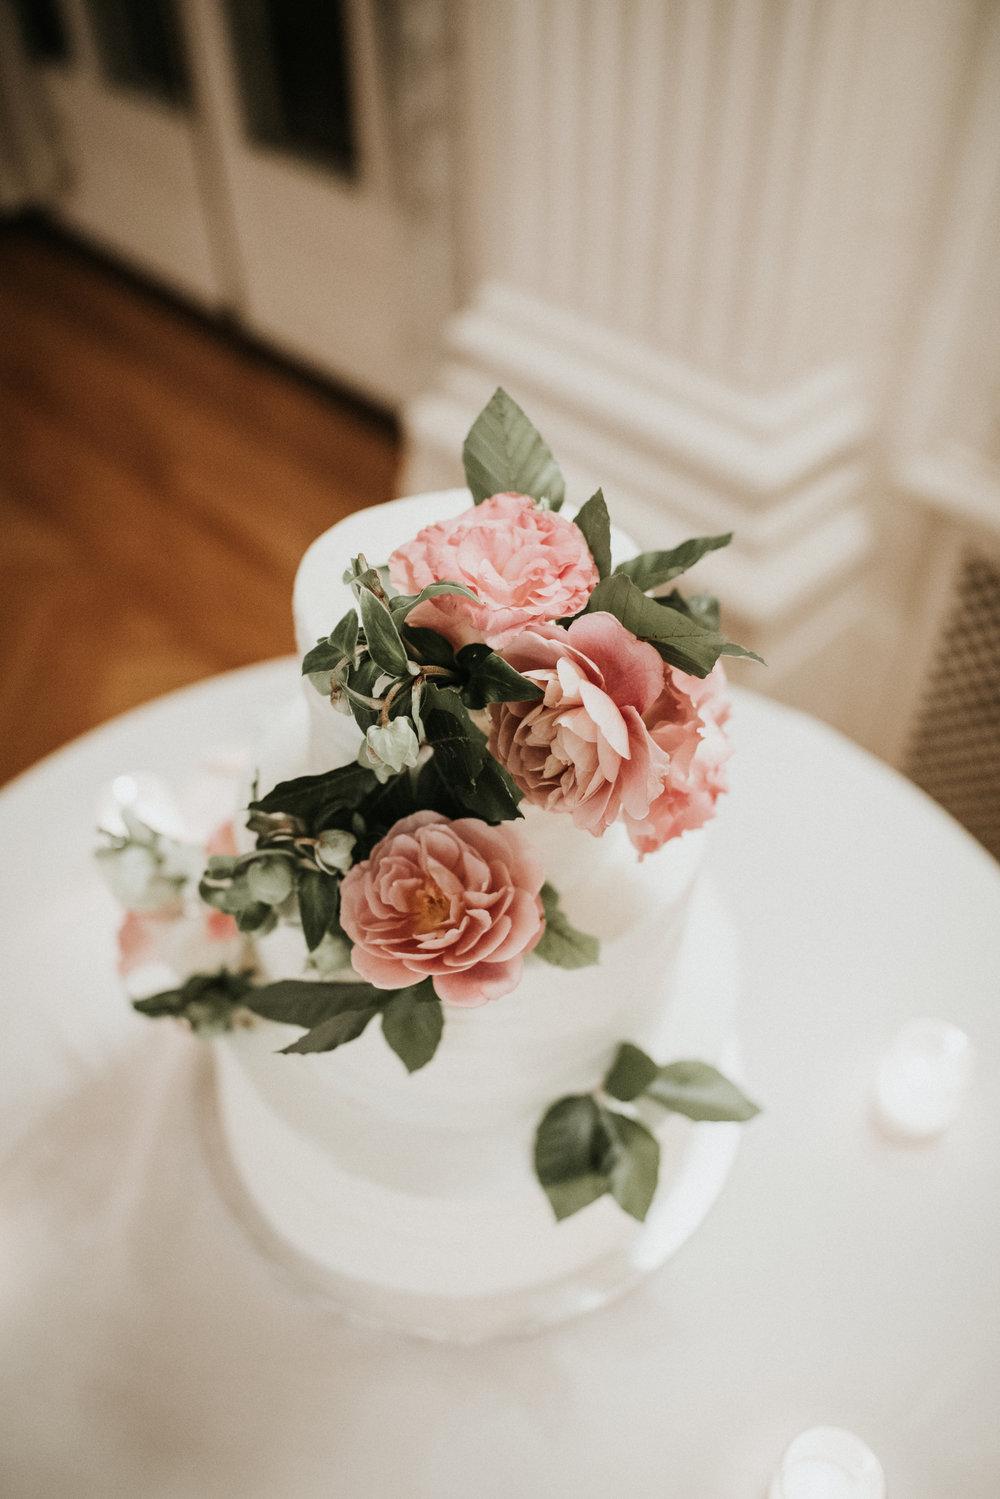 Rosecliff-Mansion-Wedding-Newport-54.jpg